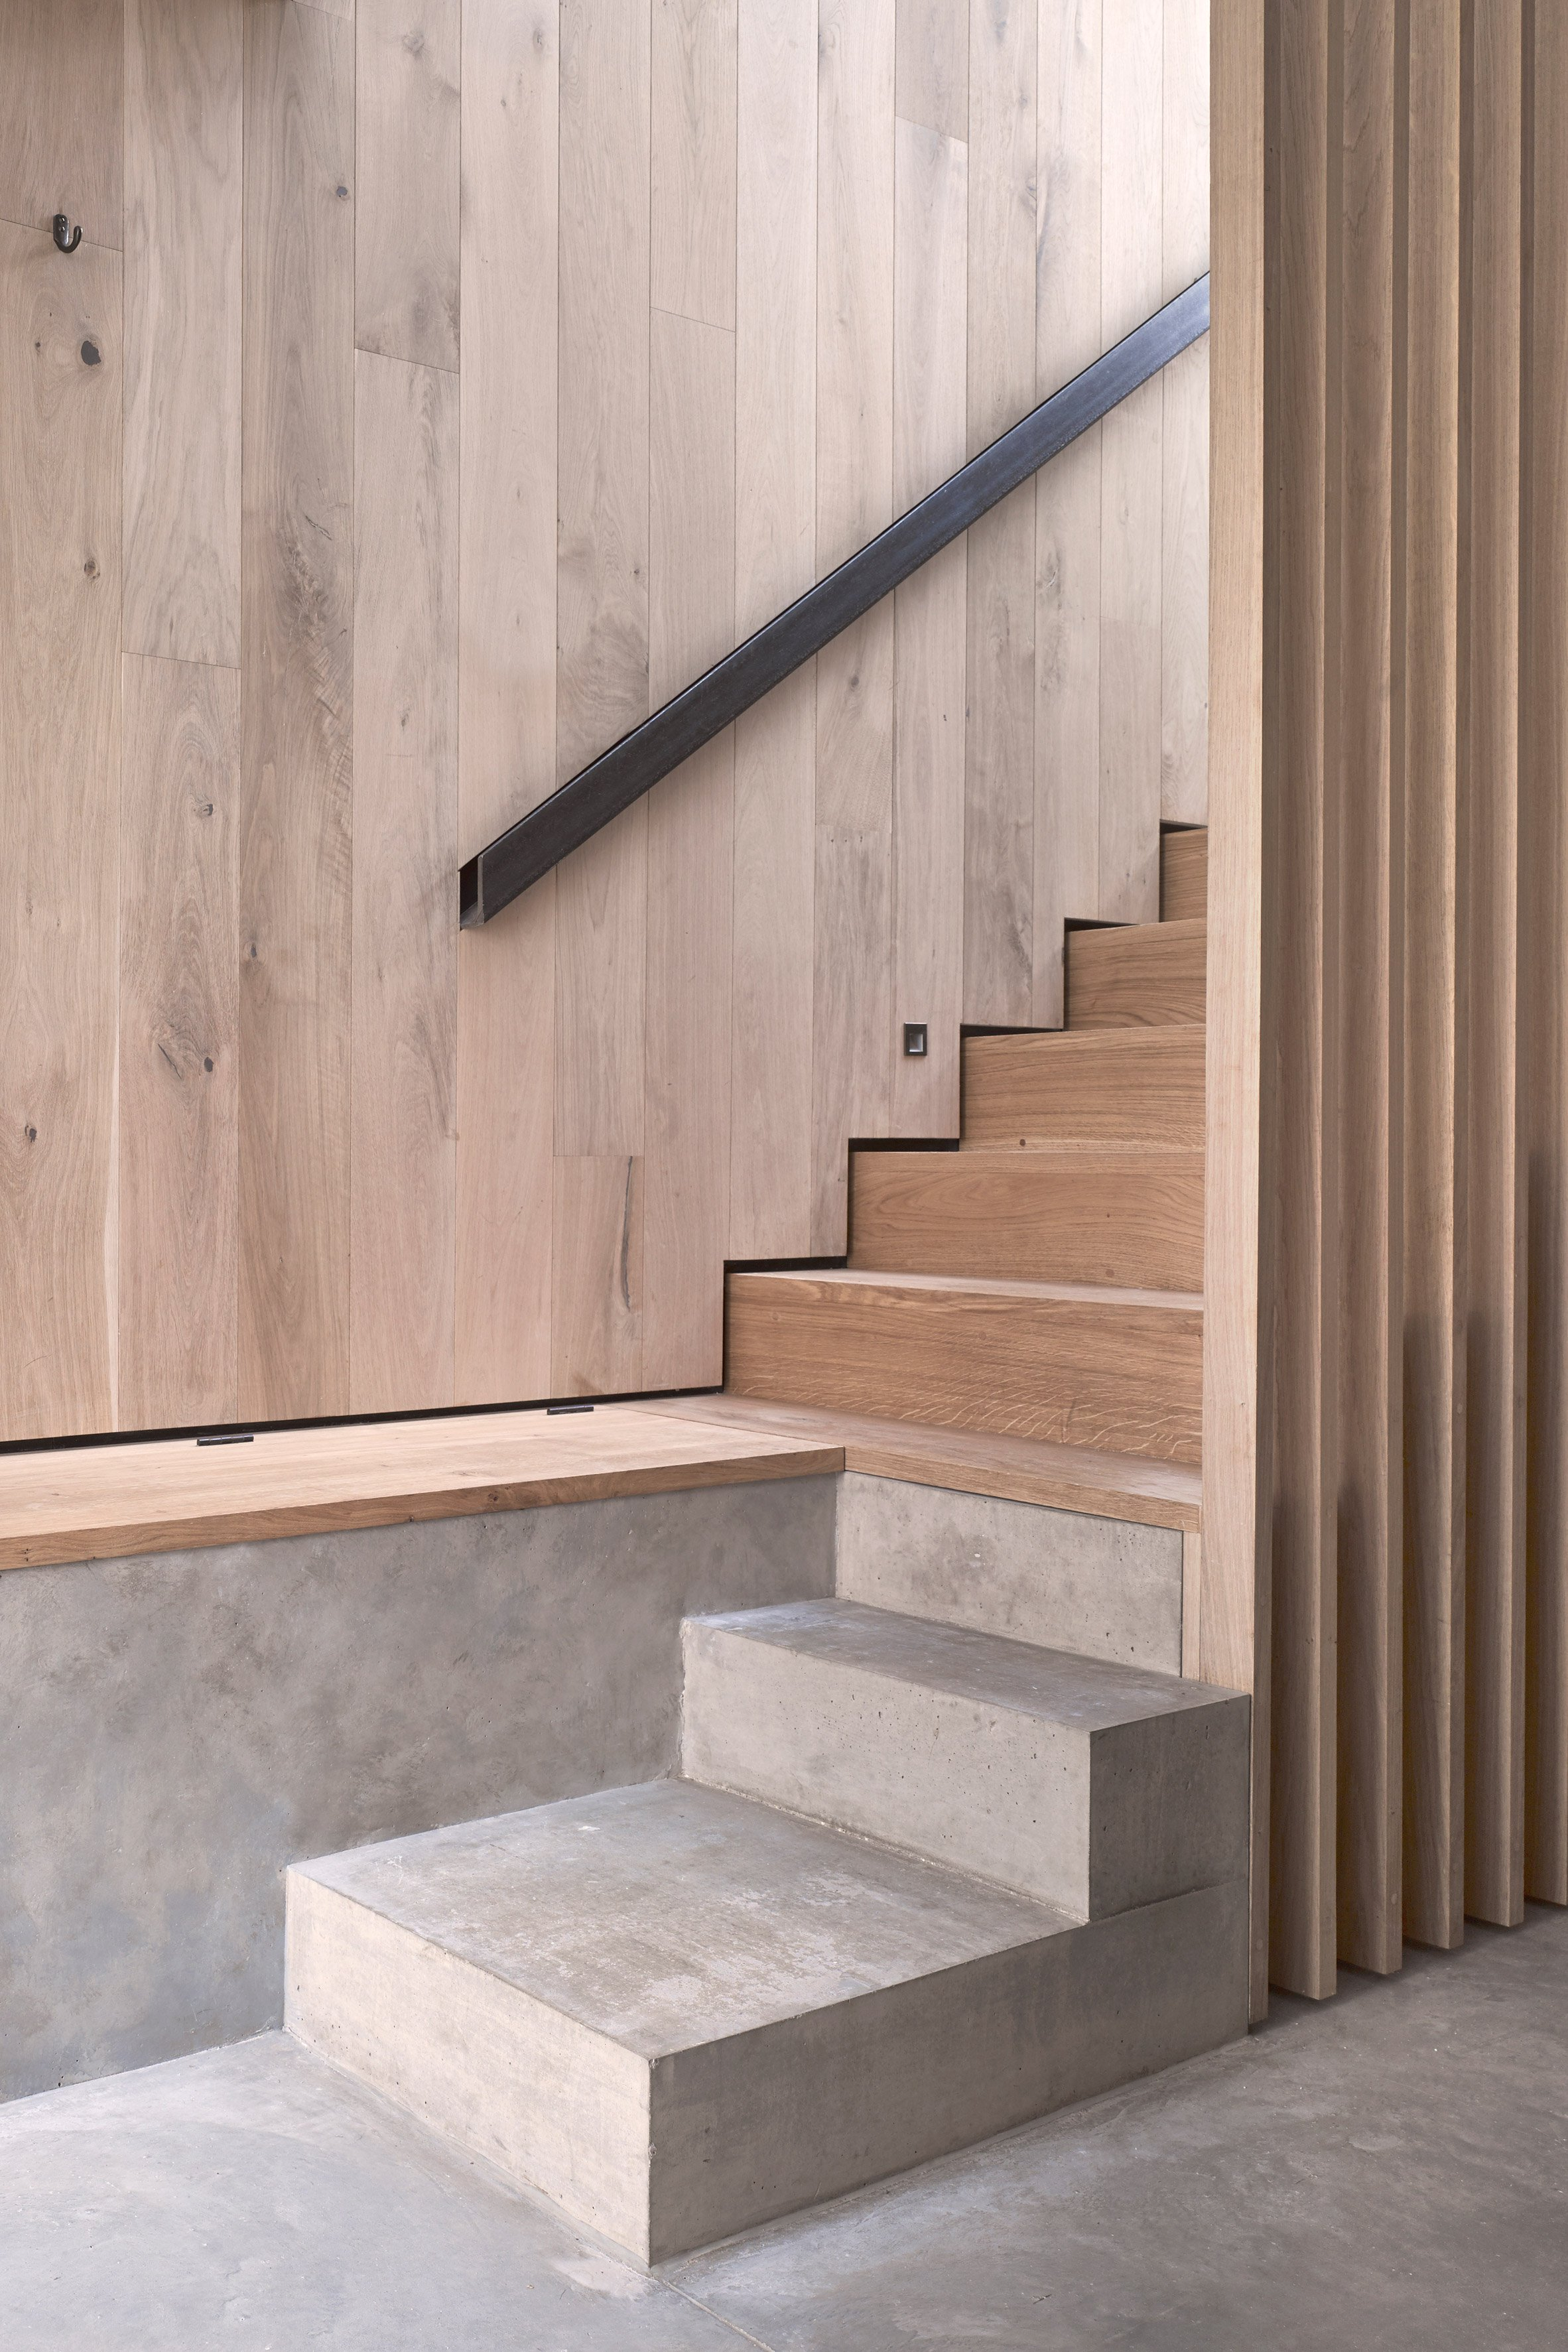 architecture-residential-london-interior-design-studia-osnovadesign-osnova-poltava_08